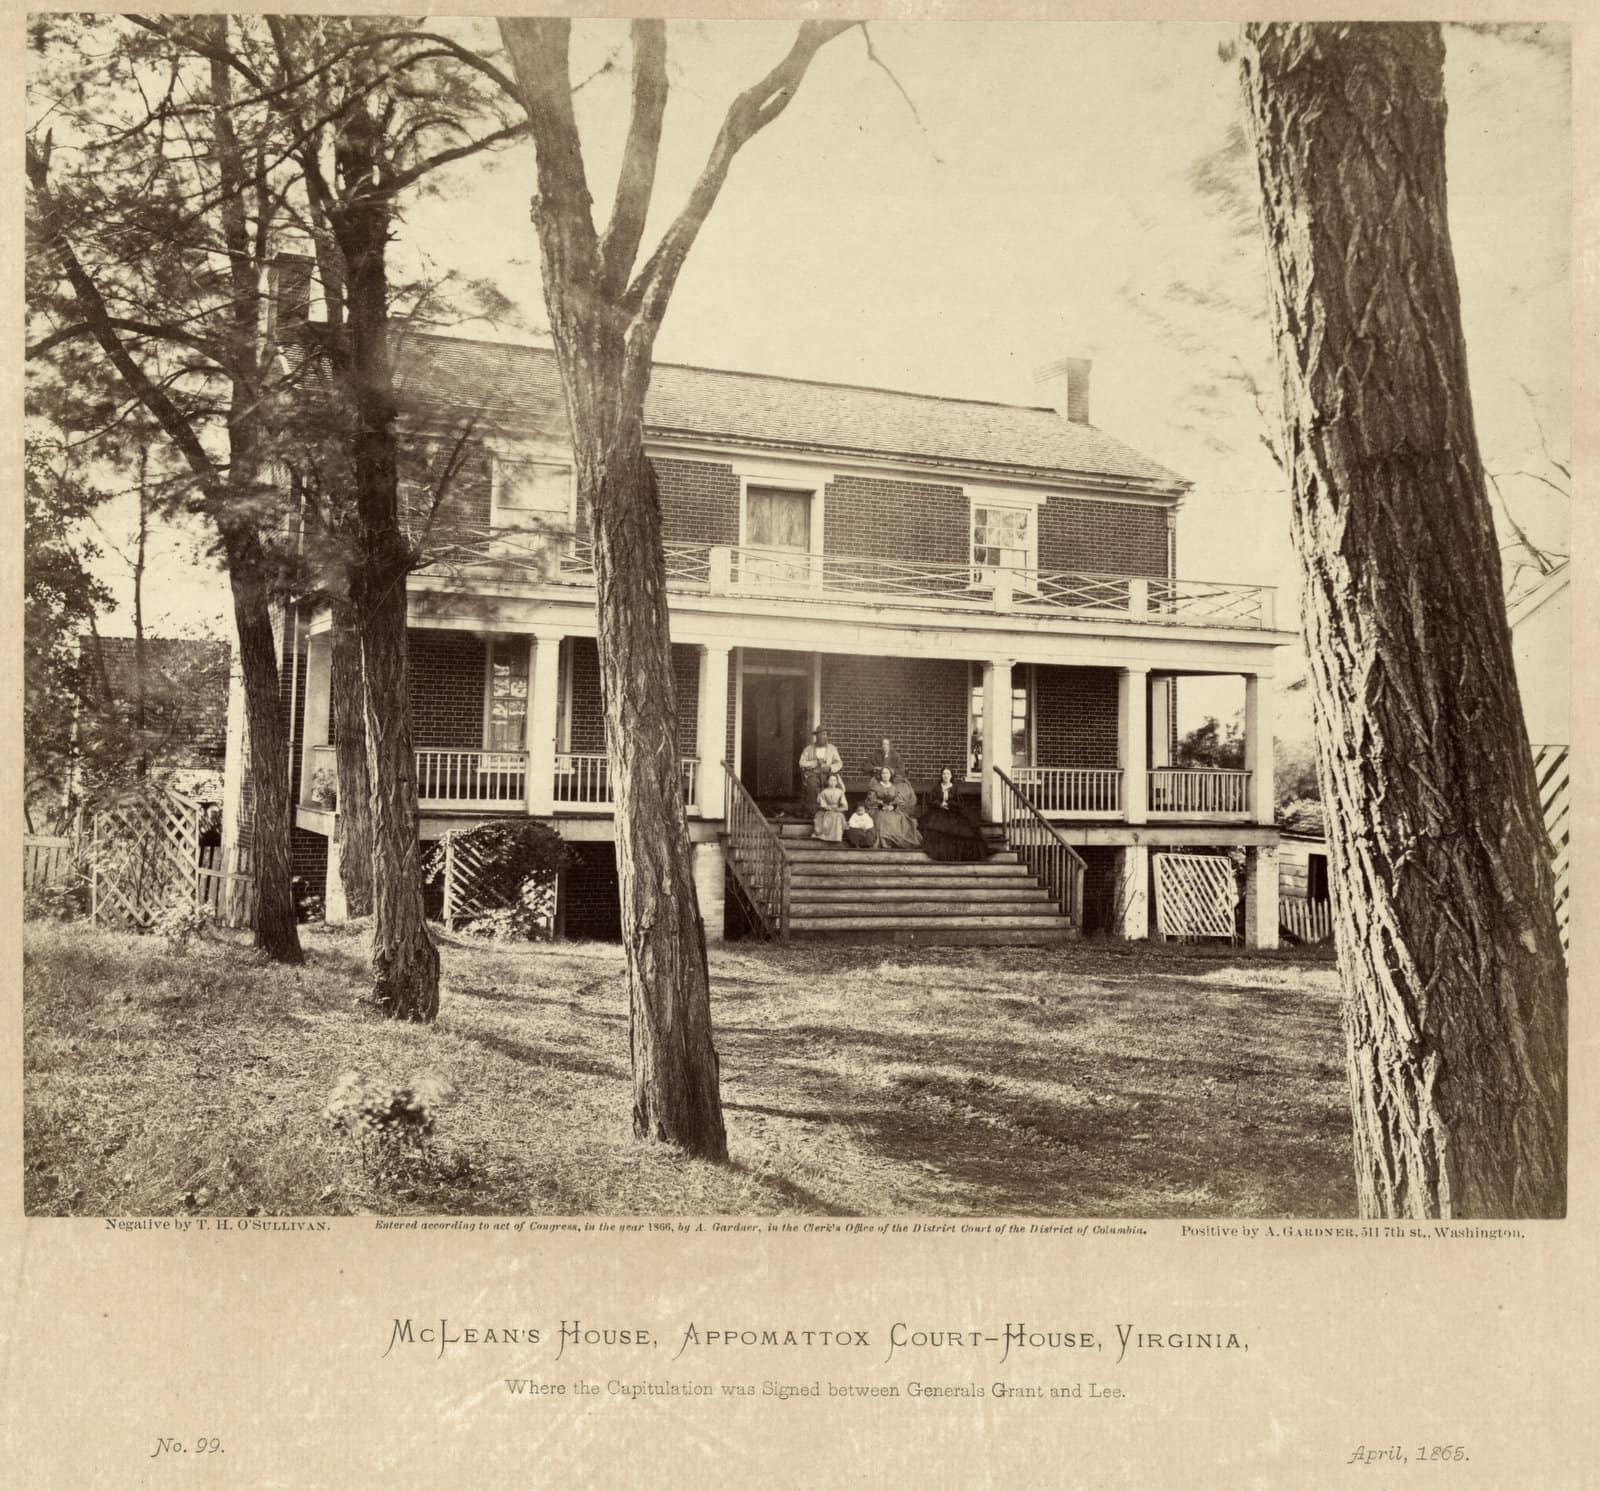 McLeans House - Appomattox Court House, Virginia